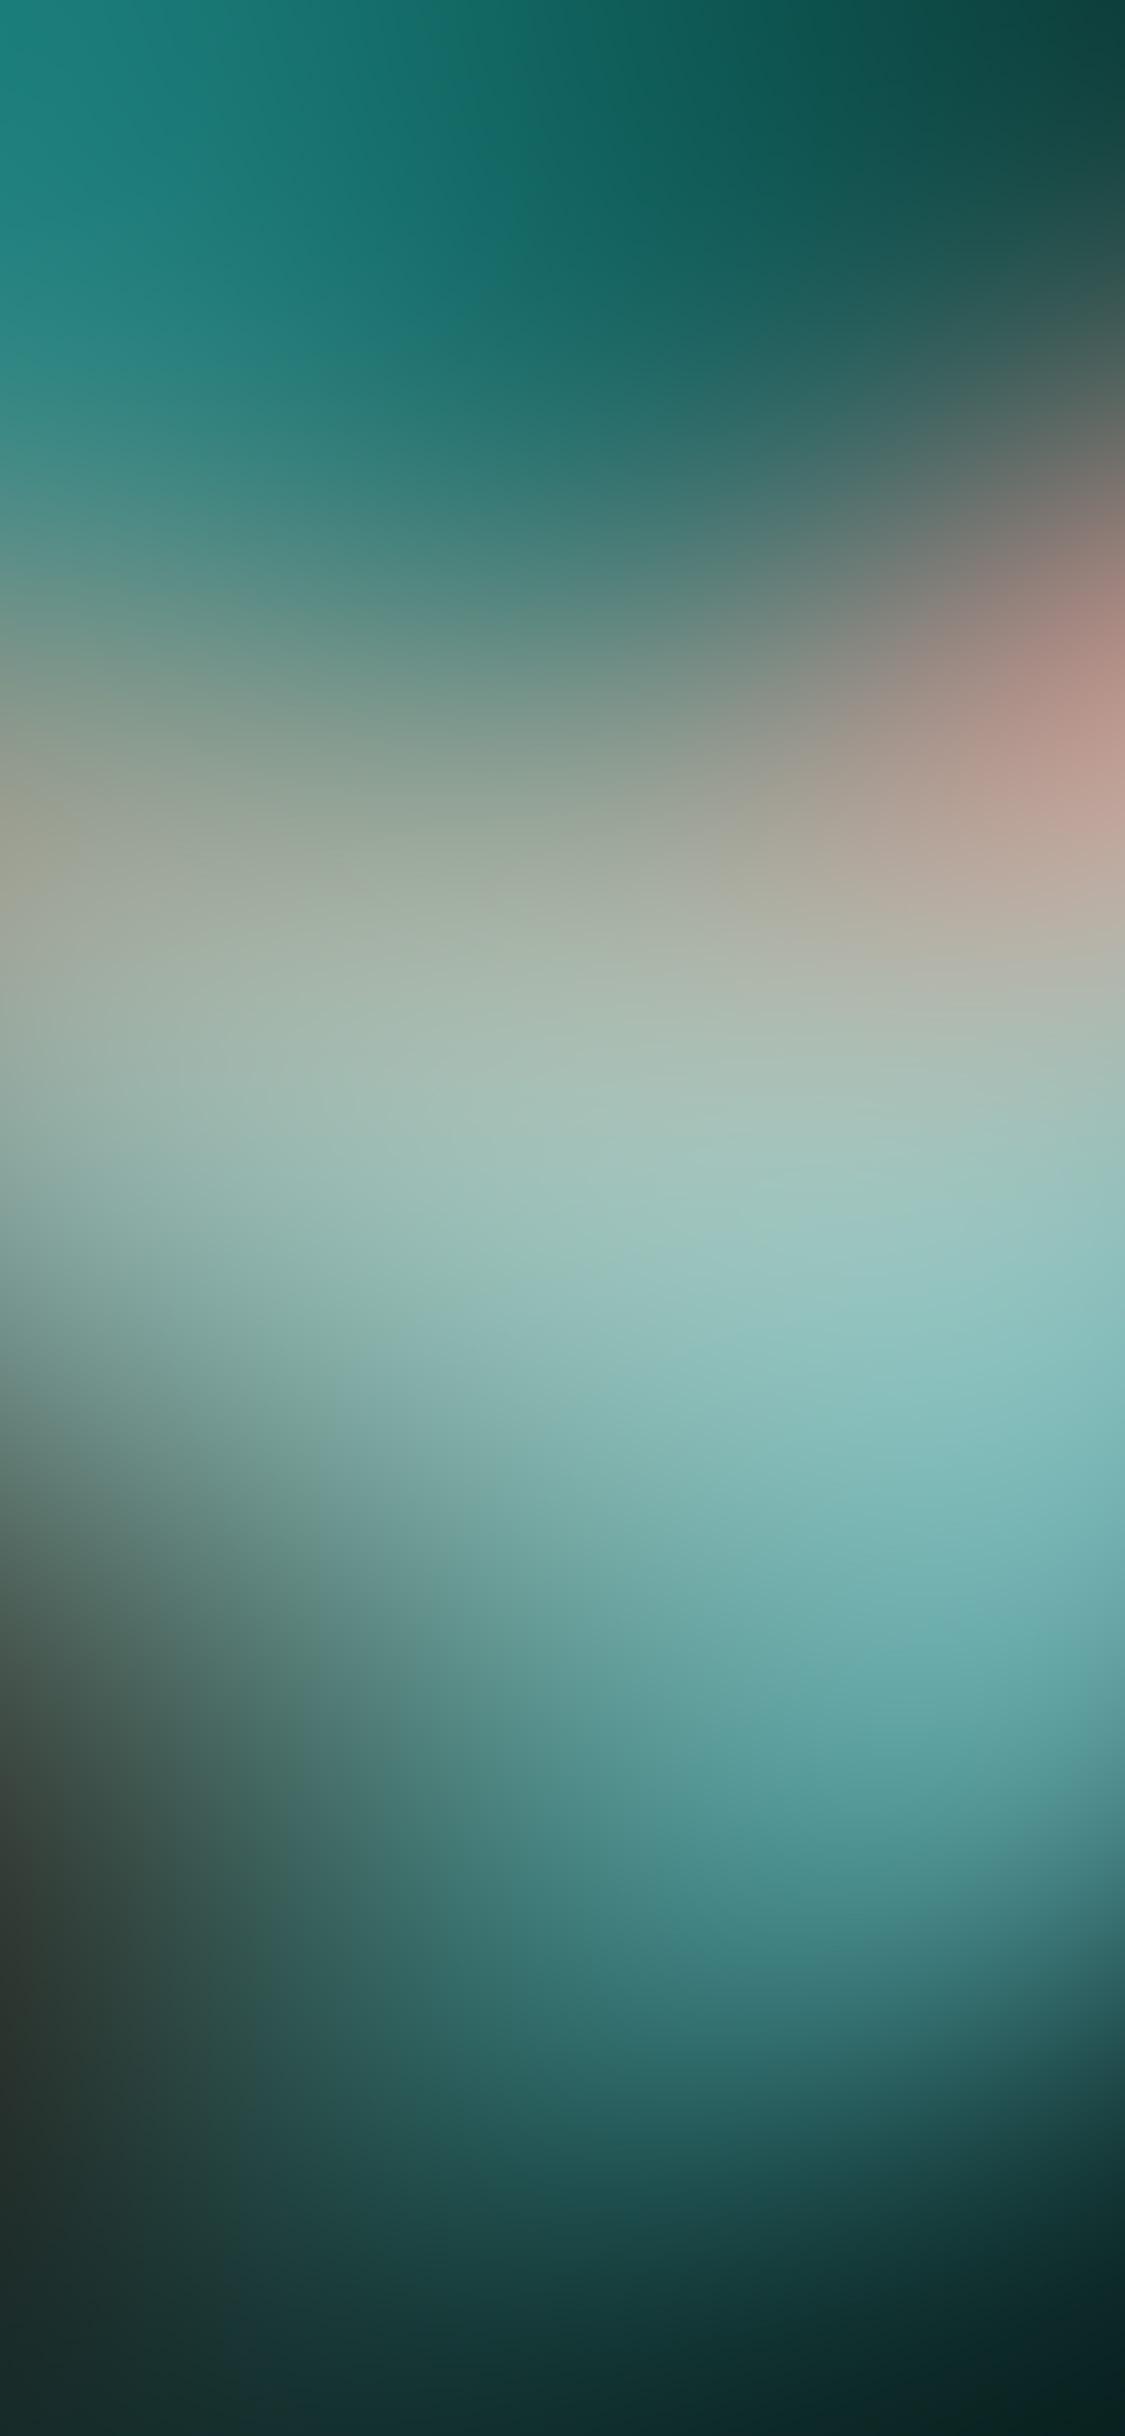 iPhonexpapers.com-Apple-iPhone-wallpaper-sn50-green-night-blur-gradation